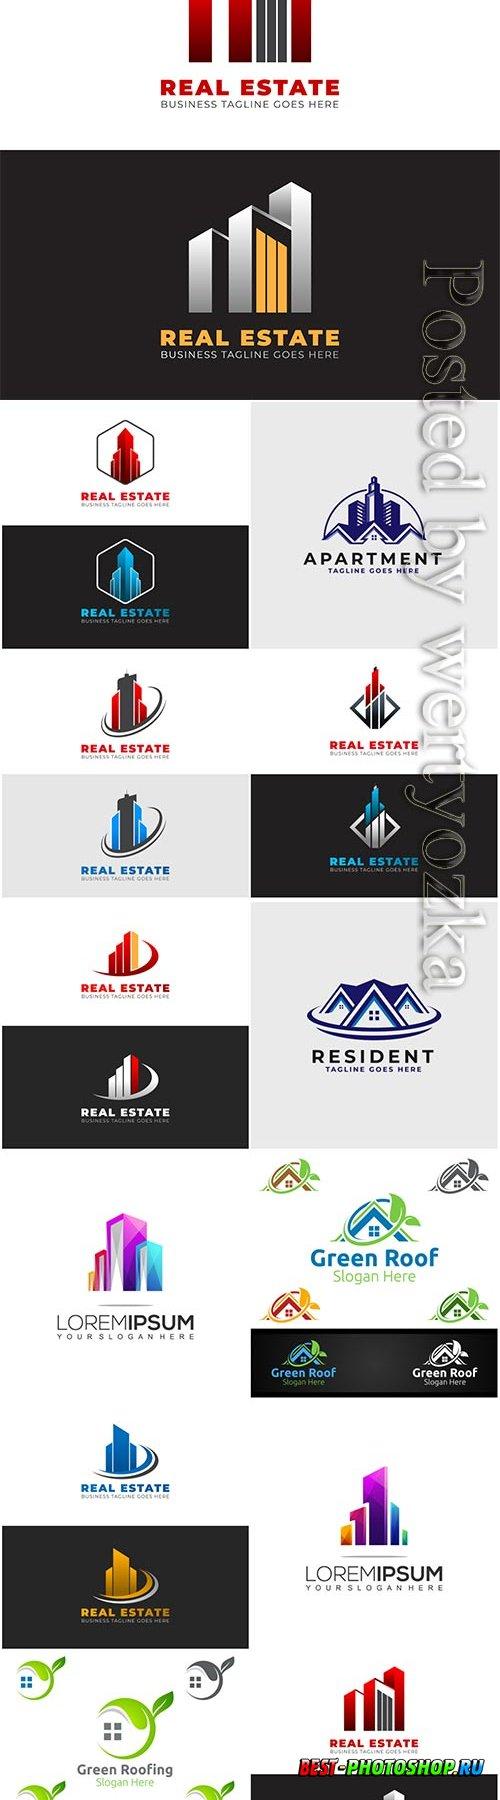 Estate logo template design with modern shapes